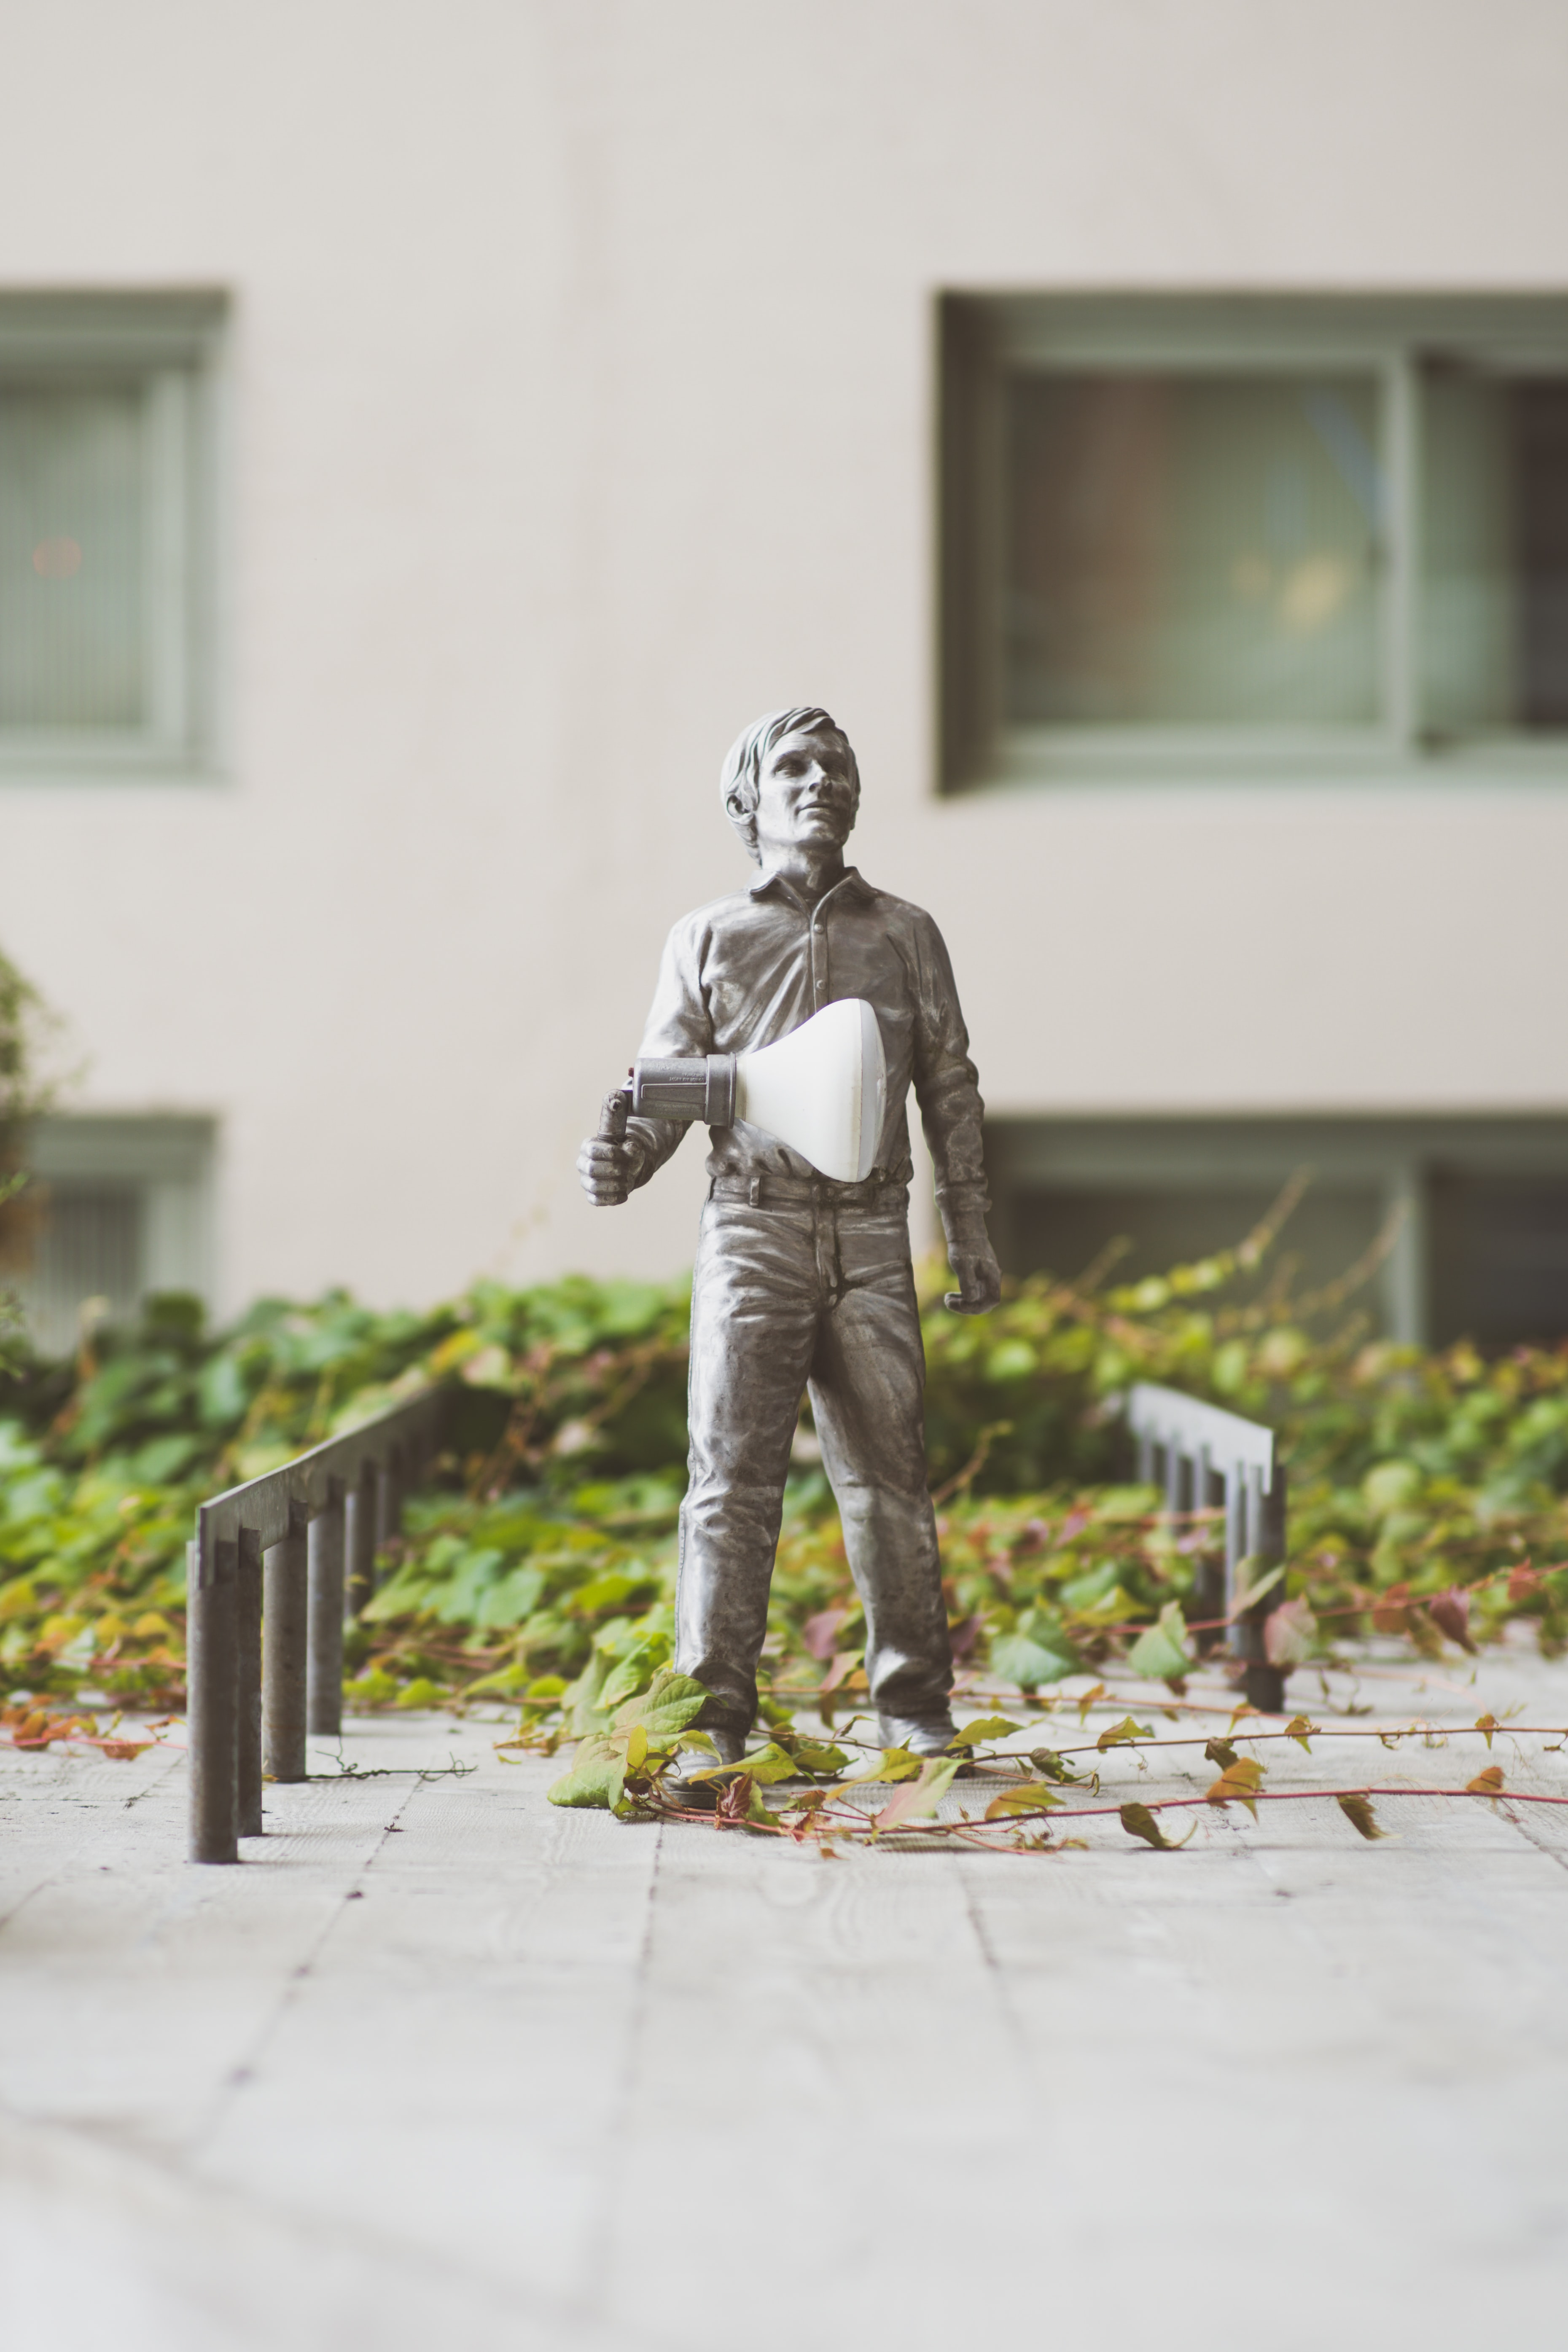 man holding bulb statue near building